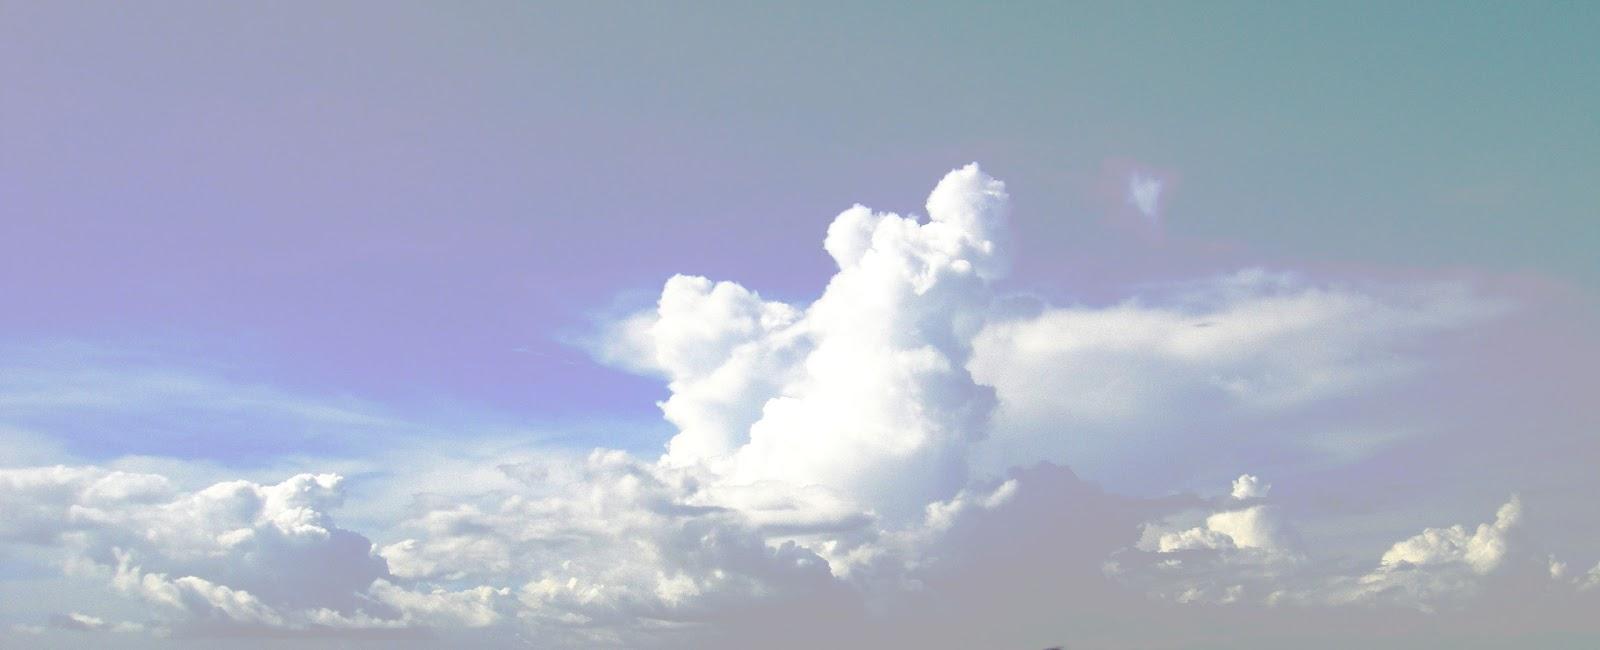 Tumblr Clouds Photography | www.pixshark.com - Images ...